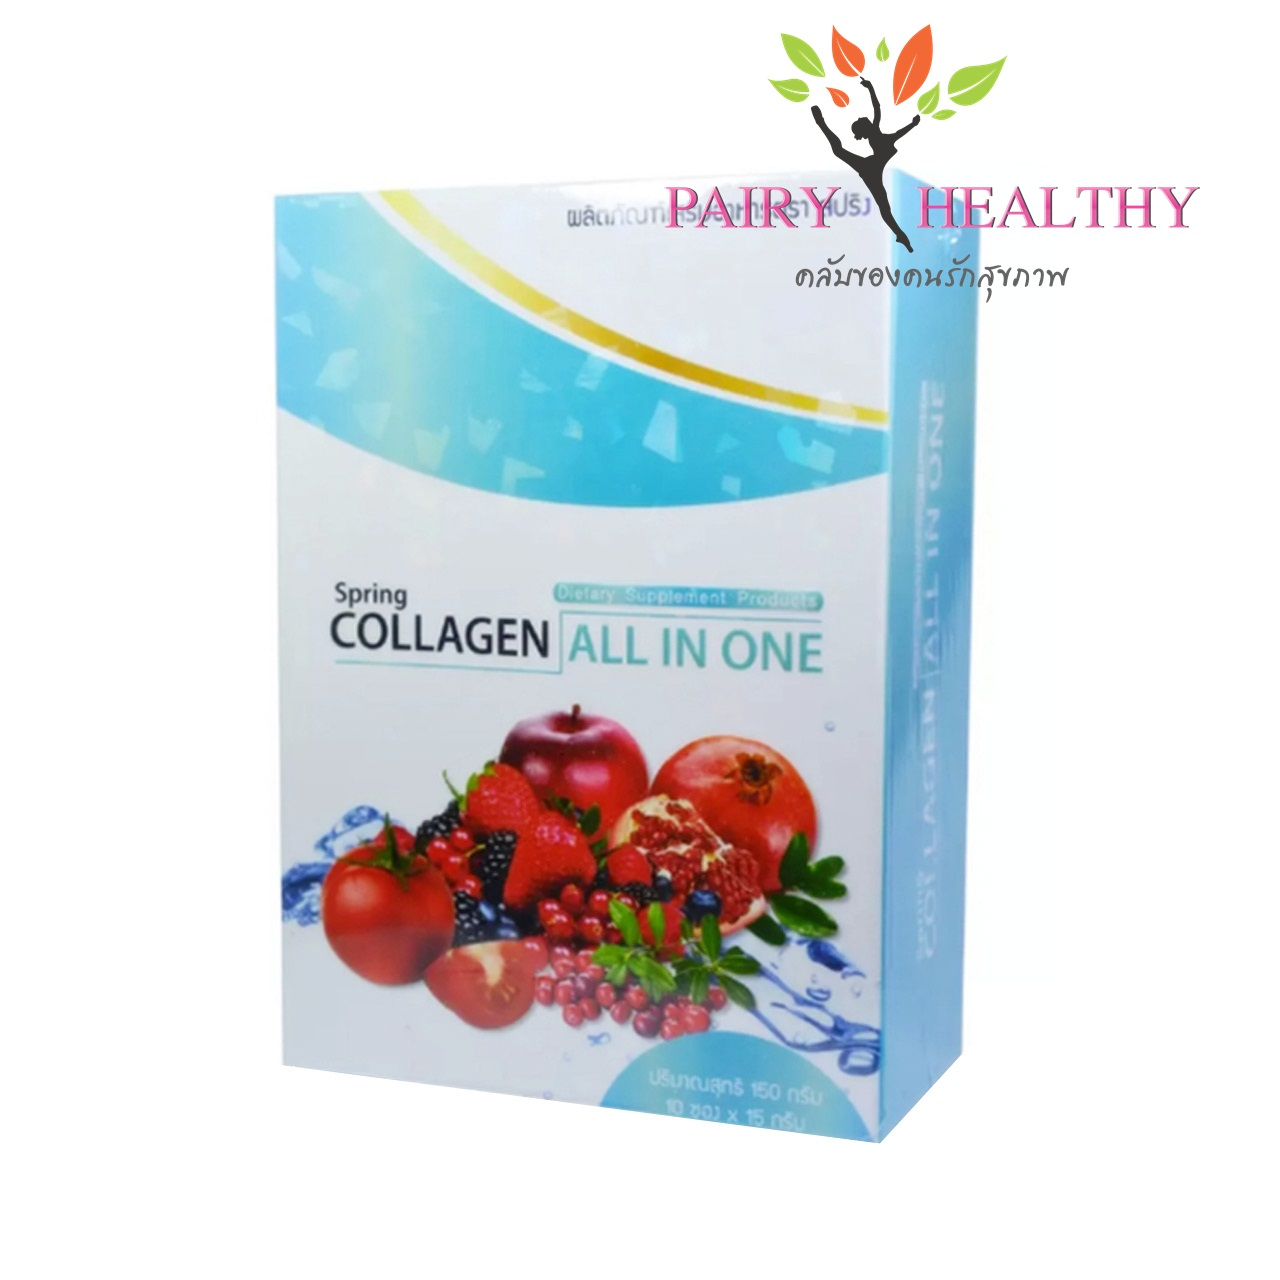 Spring Collagen All in One สปริงคอลลาเจน ออลอินวัน บรรจุ 10 ซอง ราคา 295 บาท ส่งฟรี